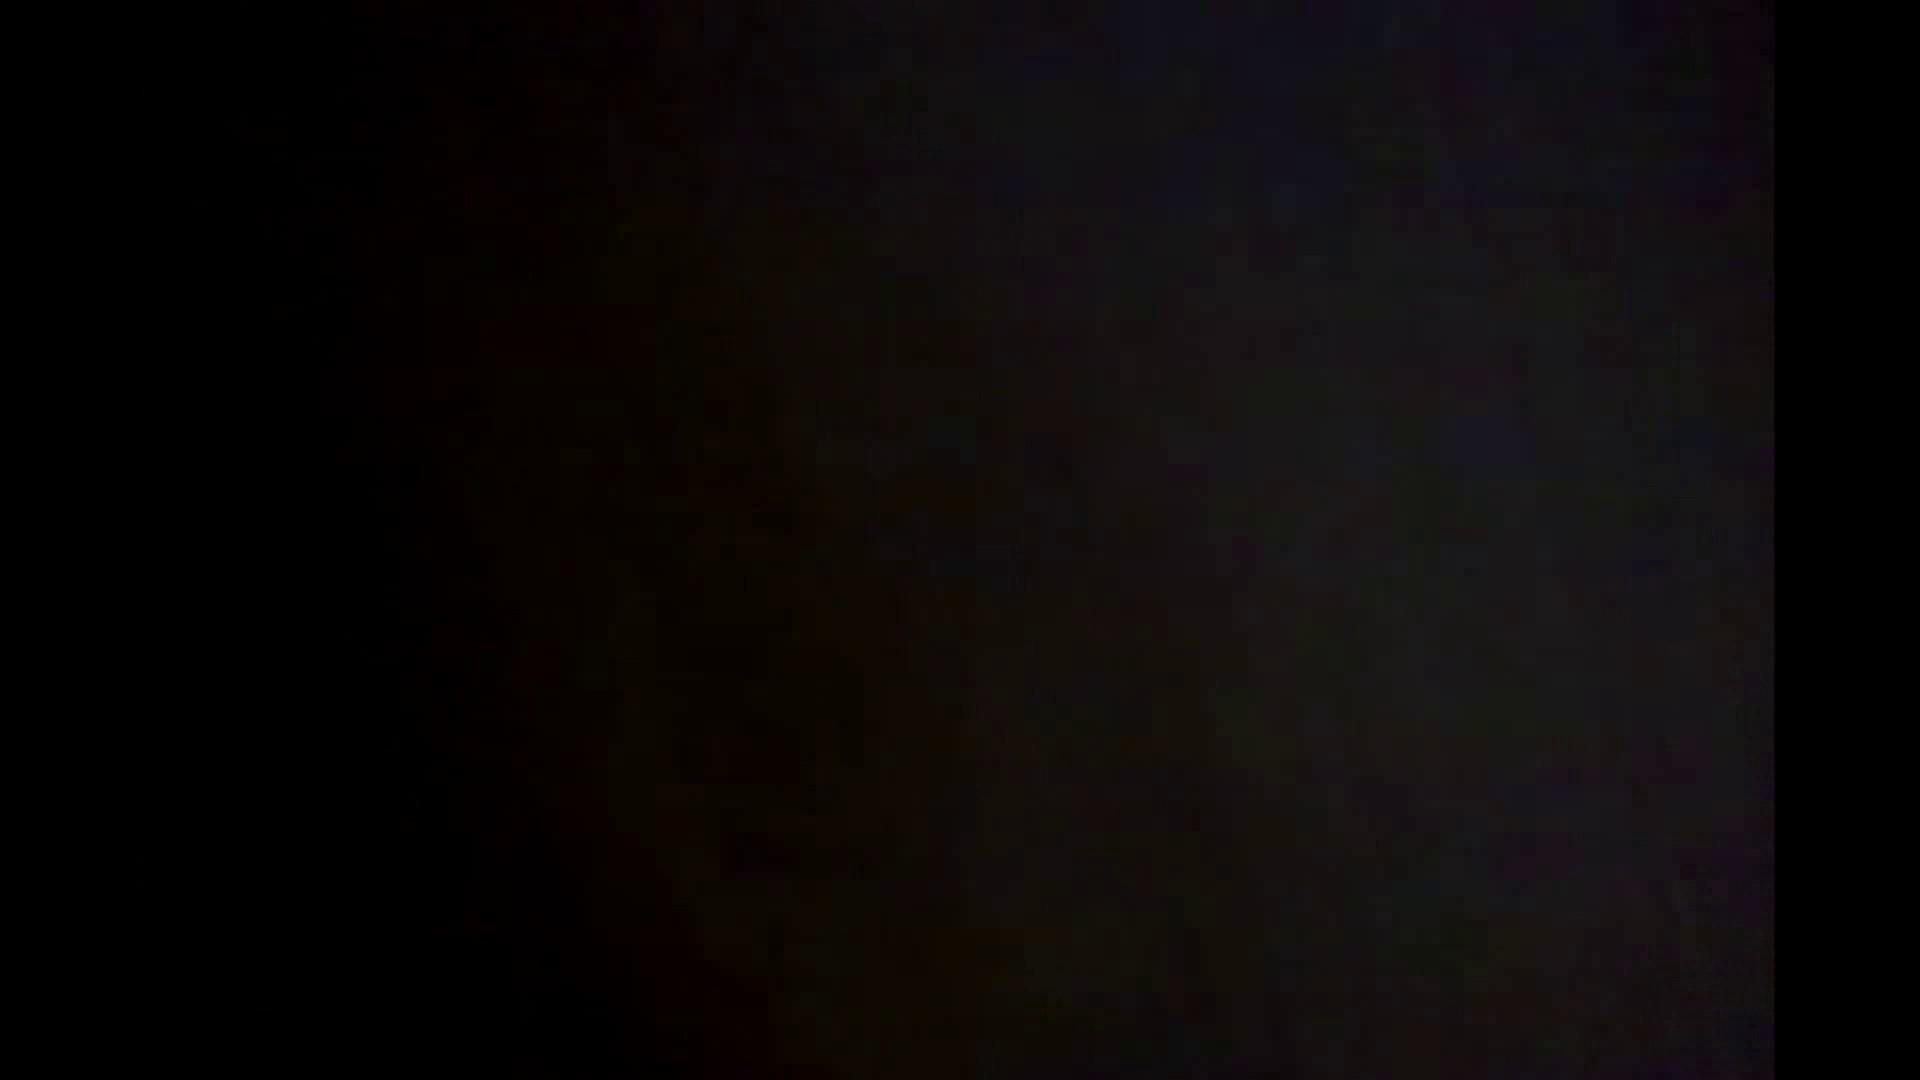 潜伏韓国トイレ北緯38度線!Vol.05 女体盗撮   OL女体  86連発 46